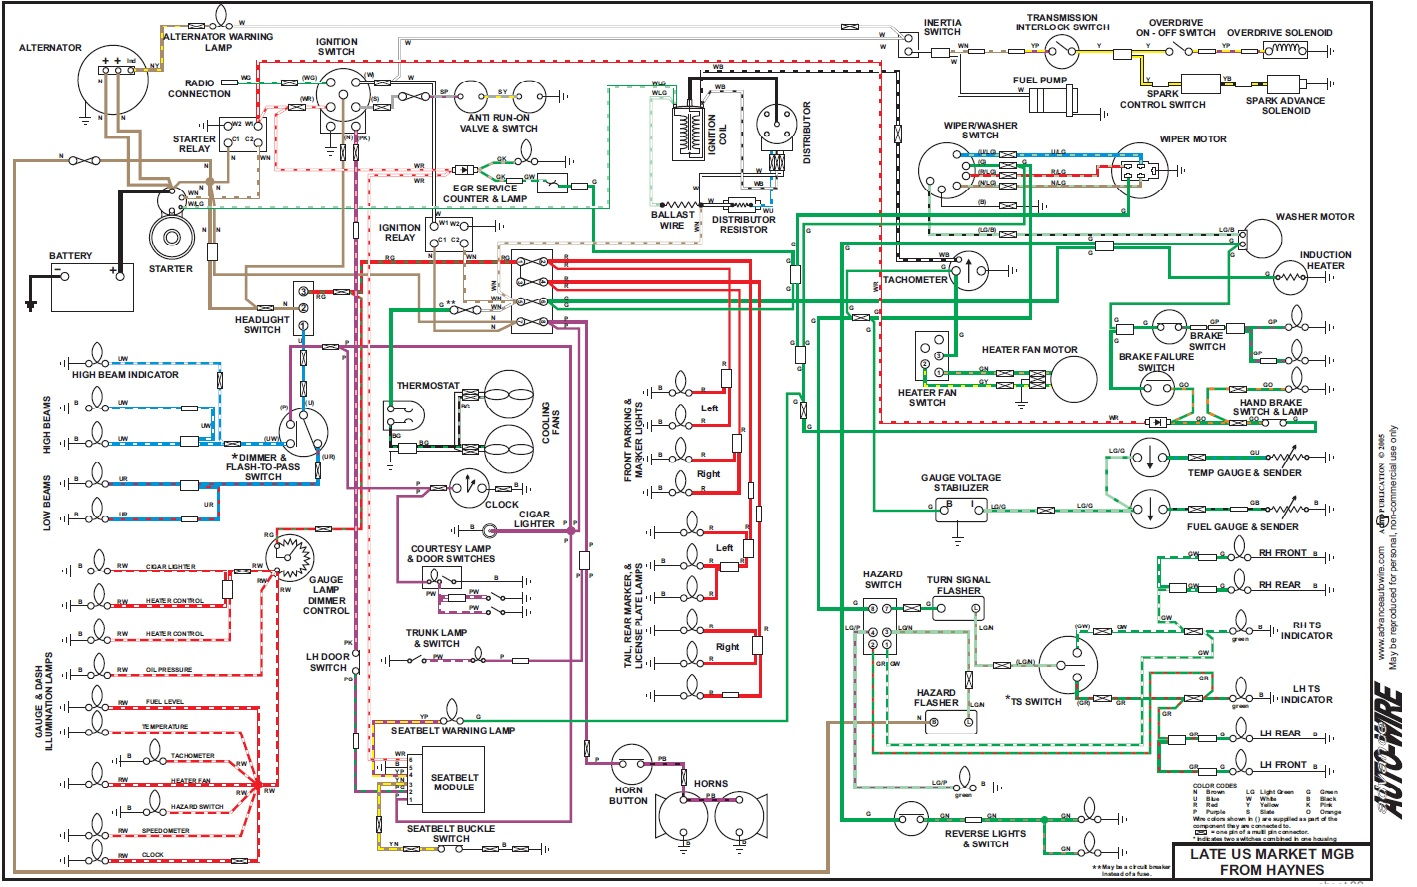 1979 Corvette Headlight Wiring Diagram Starfish Anatomy Mgb For Headlights 38